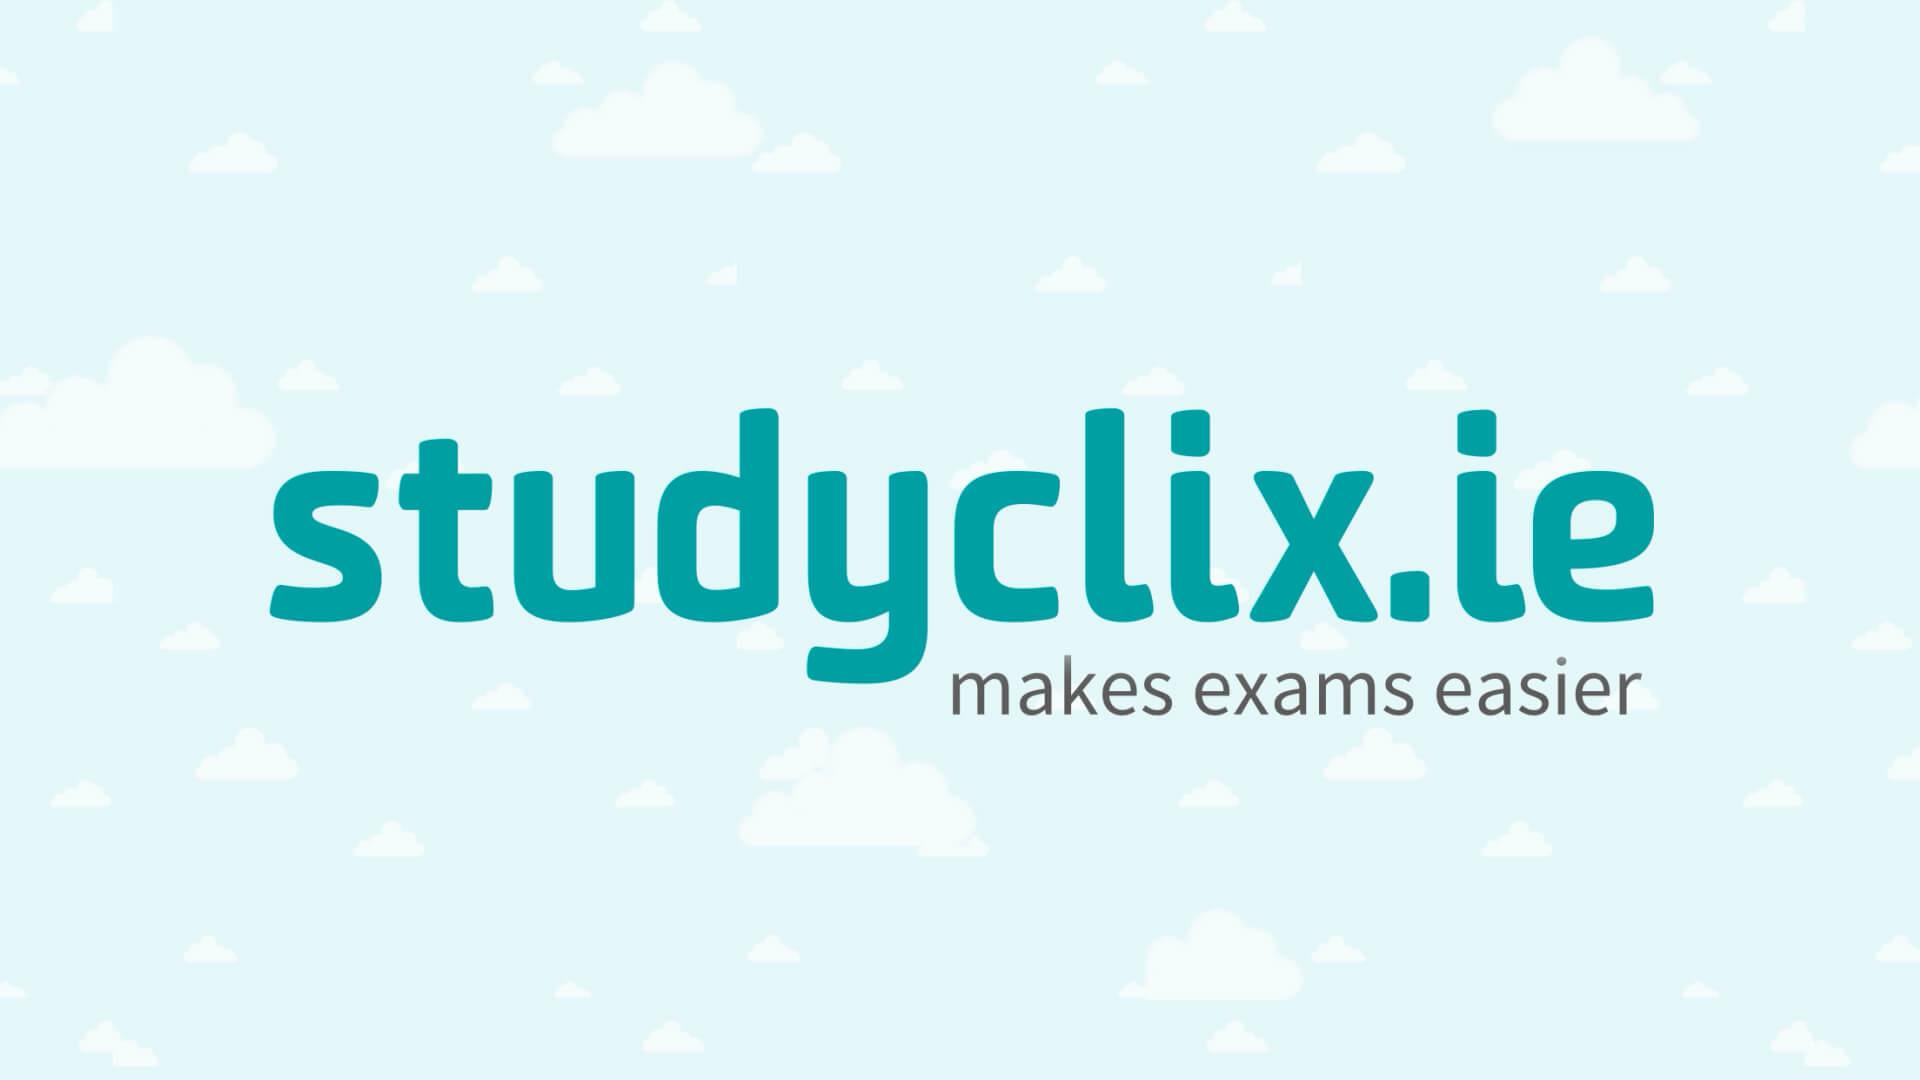 Studyclix.ie